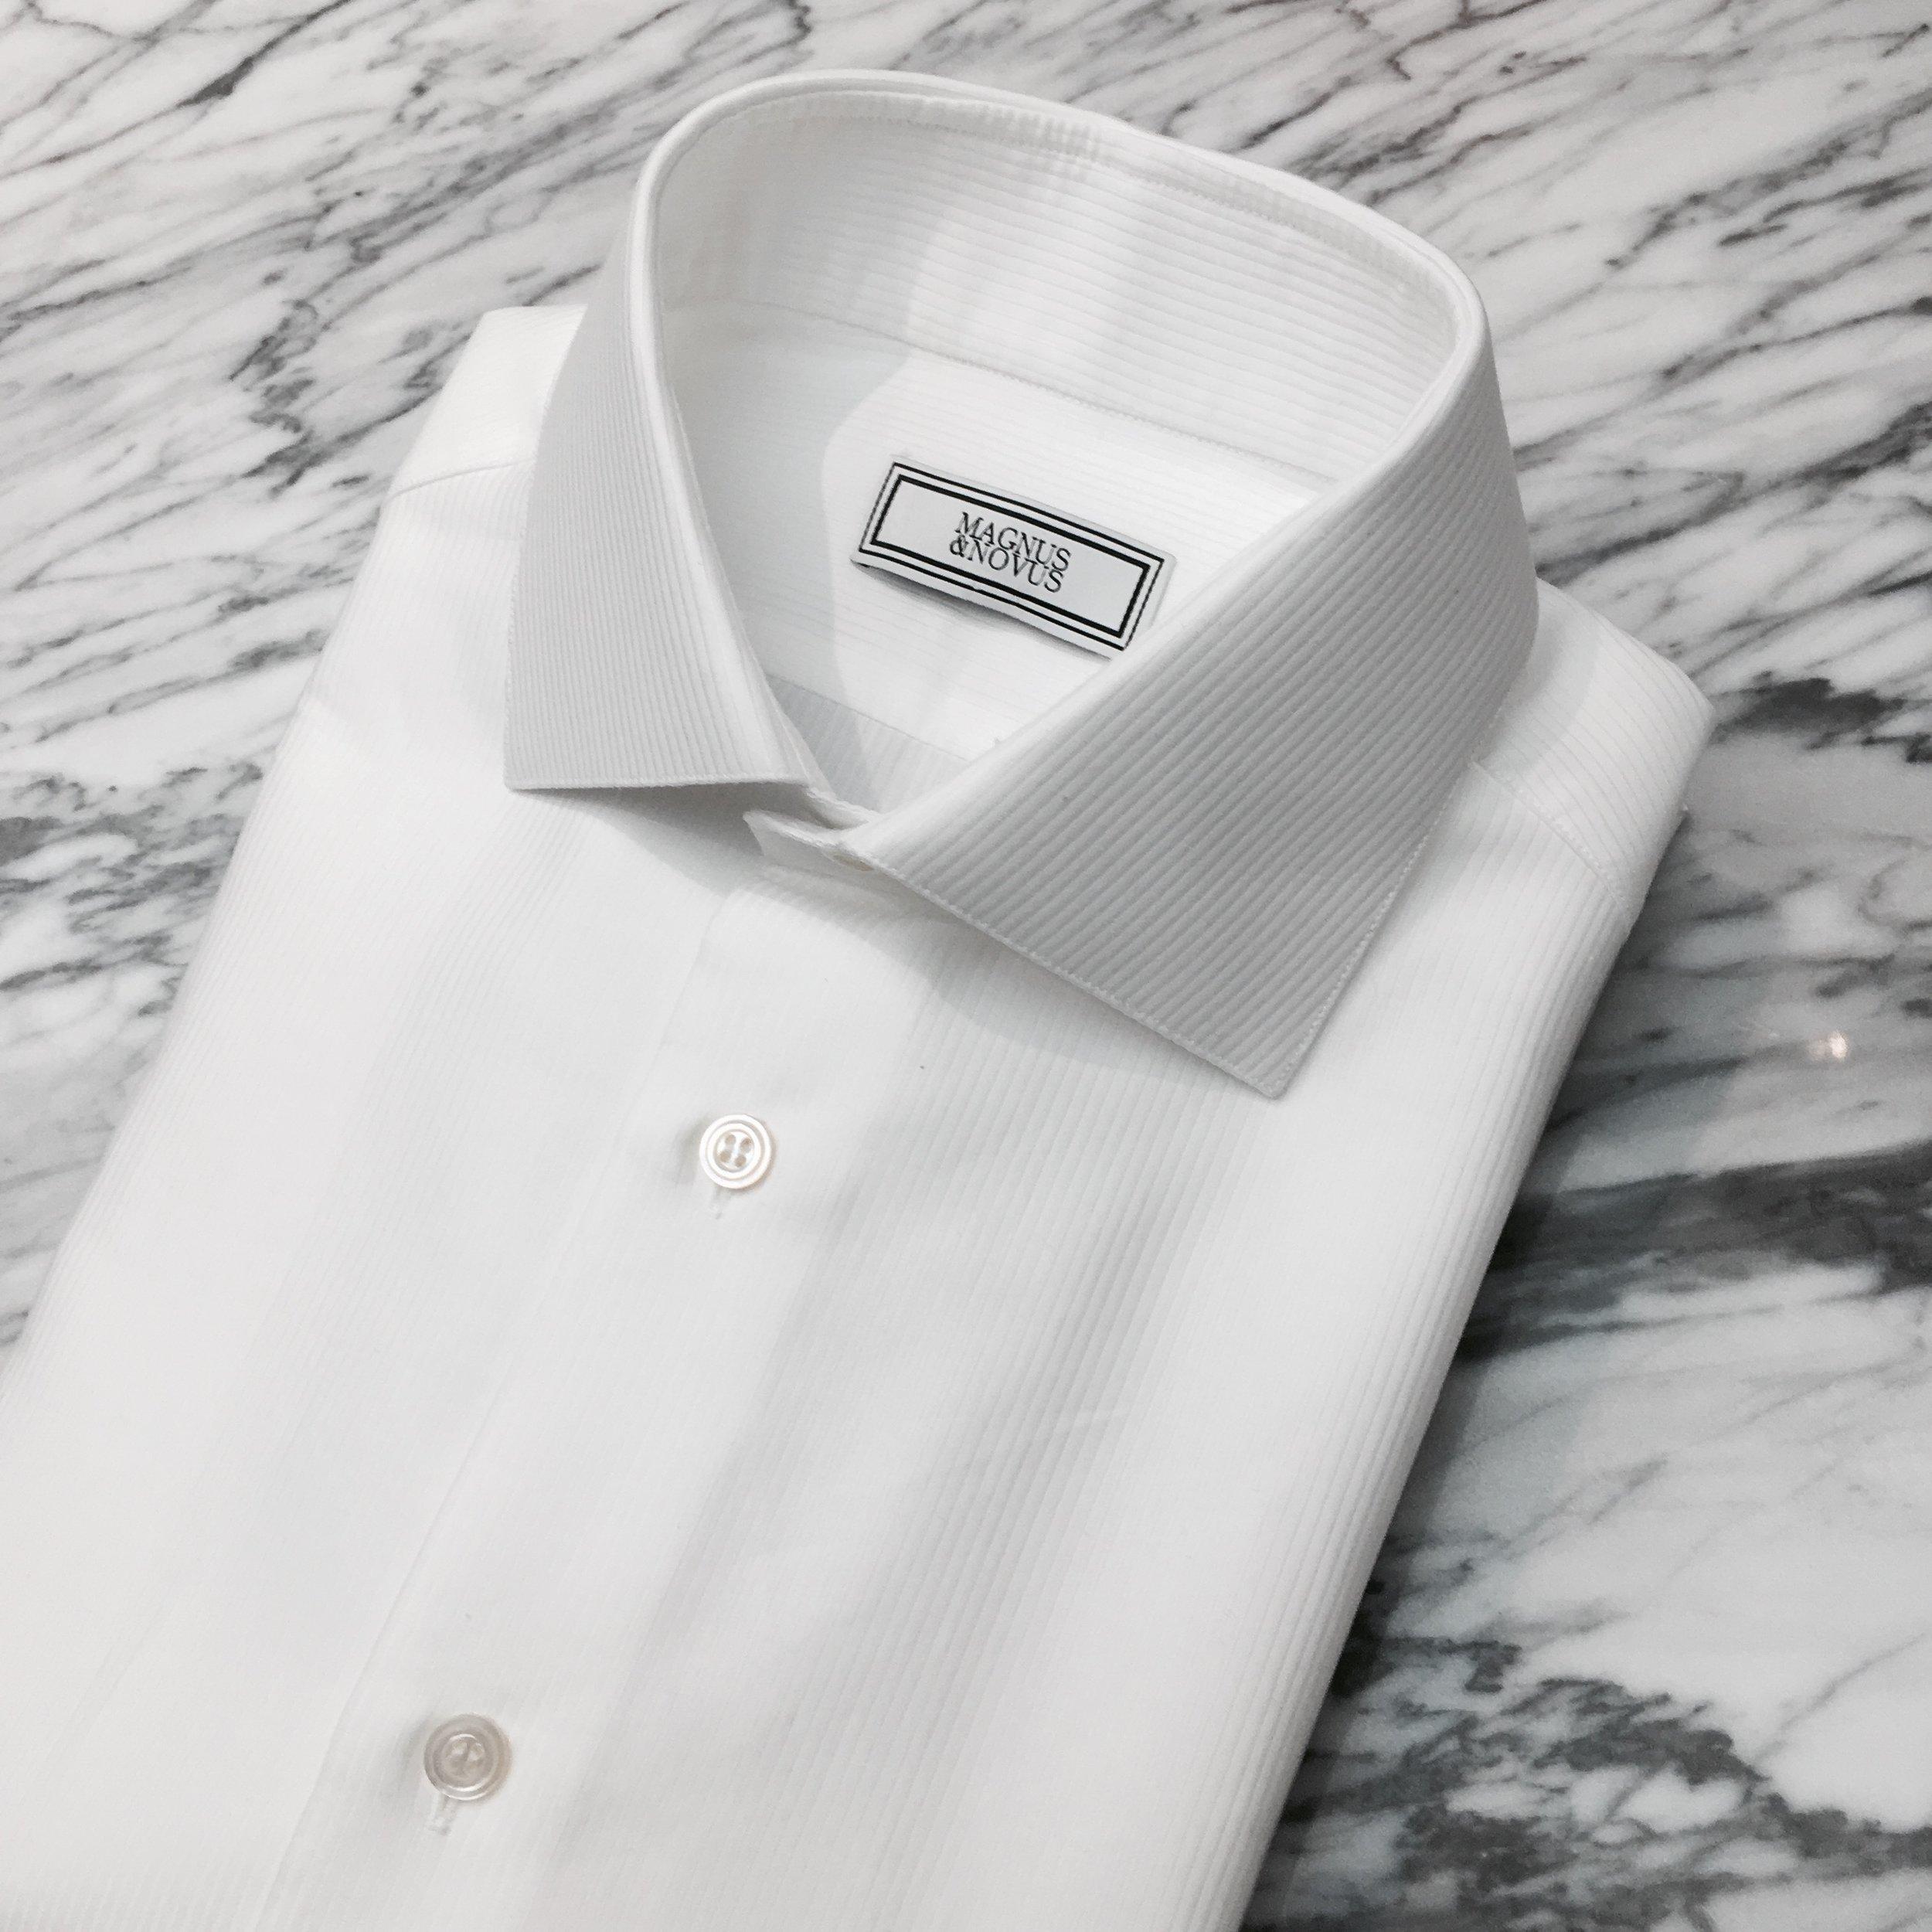 The Iconic Dress Shirt